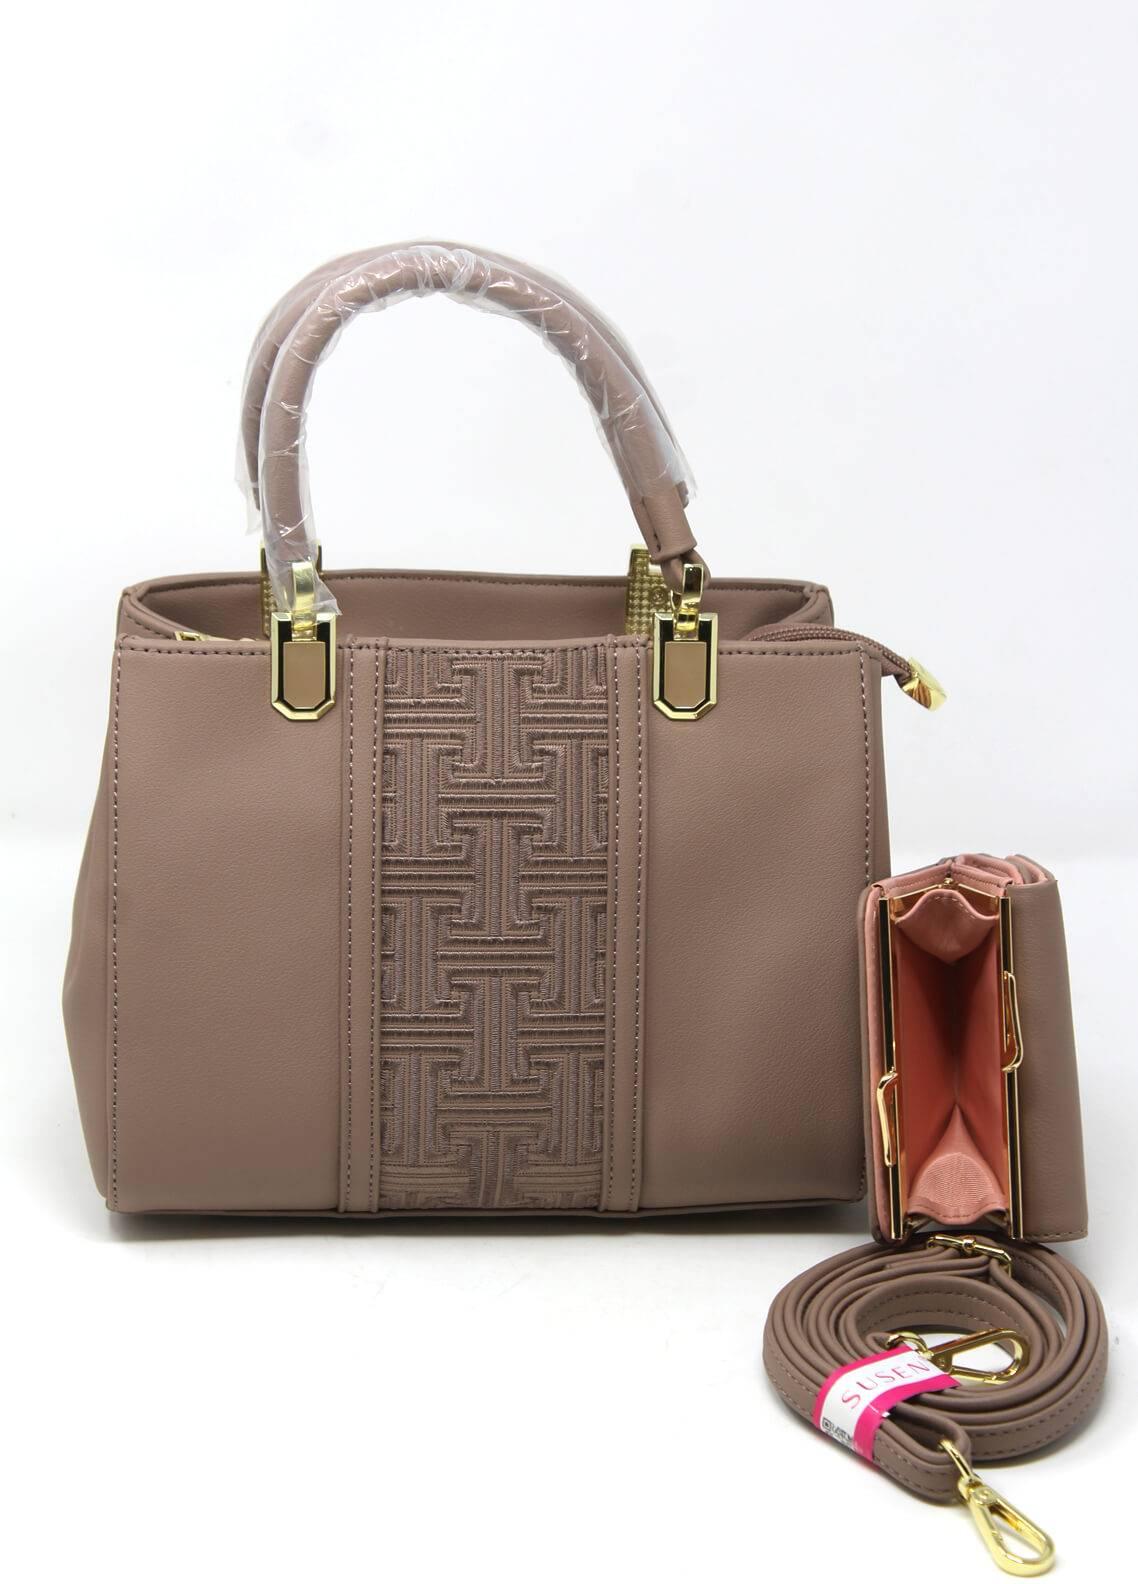 Susen PU Leather Satchels Bag for Women - Beige with Plain Texture